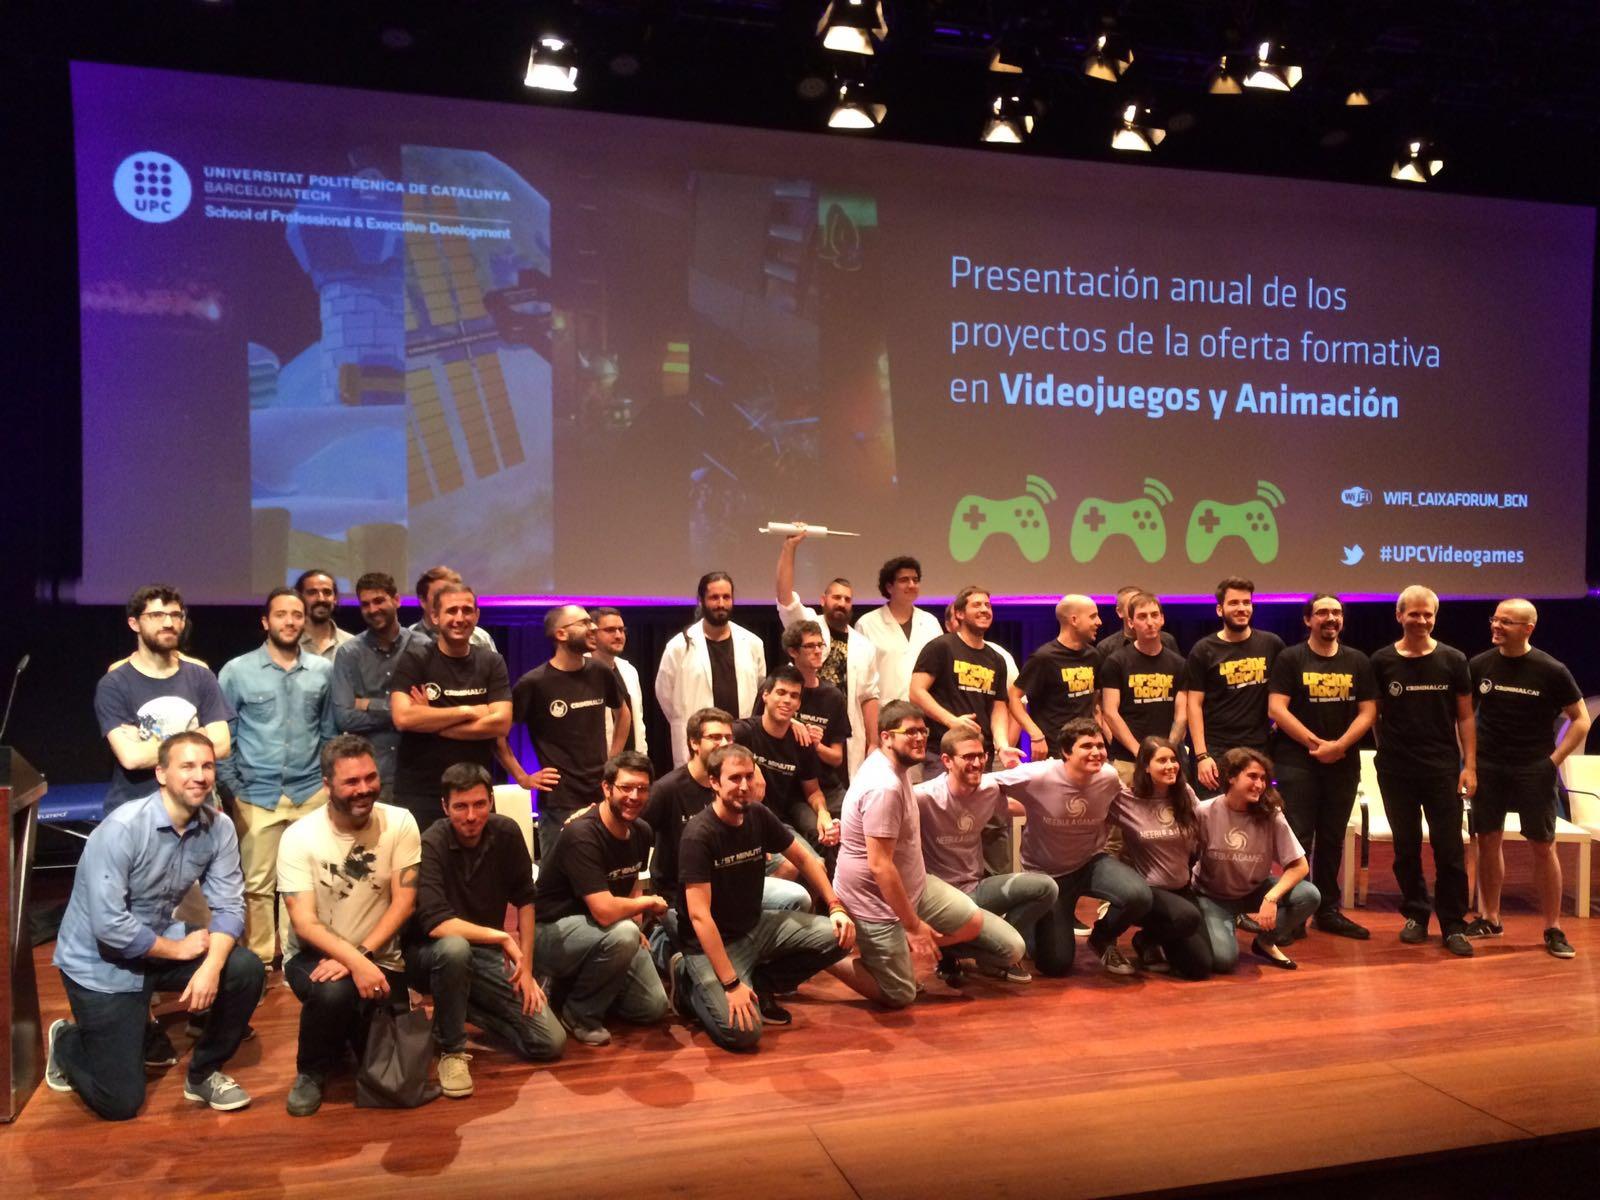 ProyectosVideojuegos